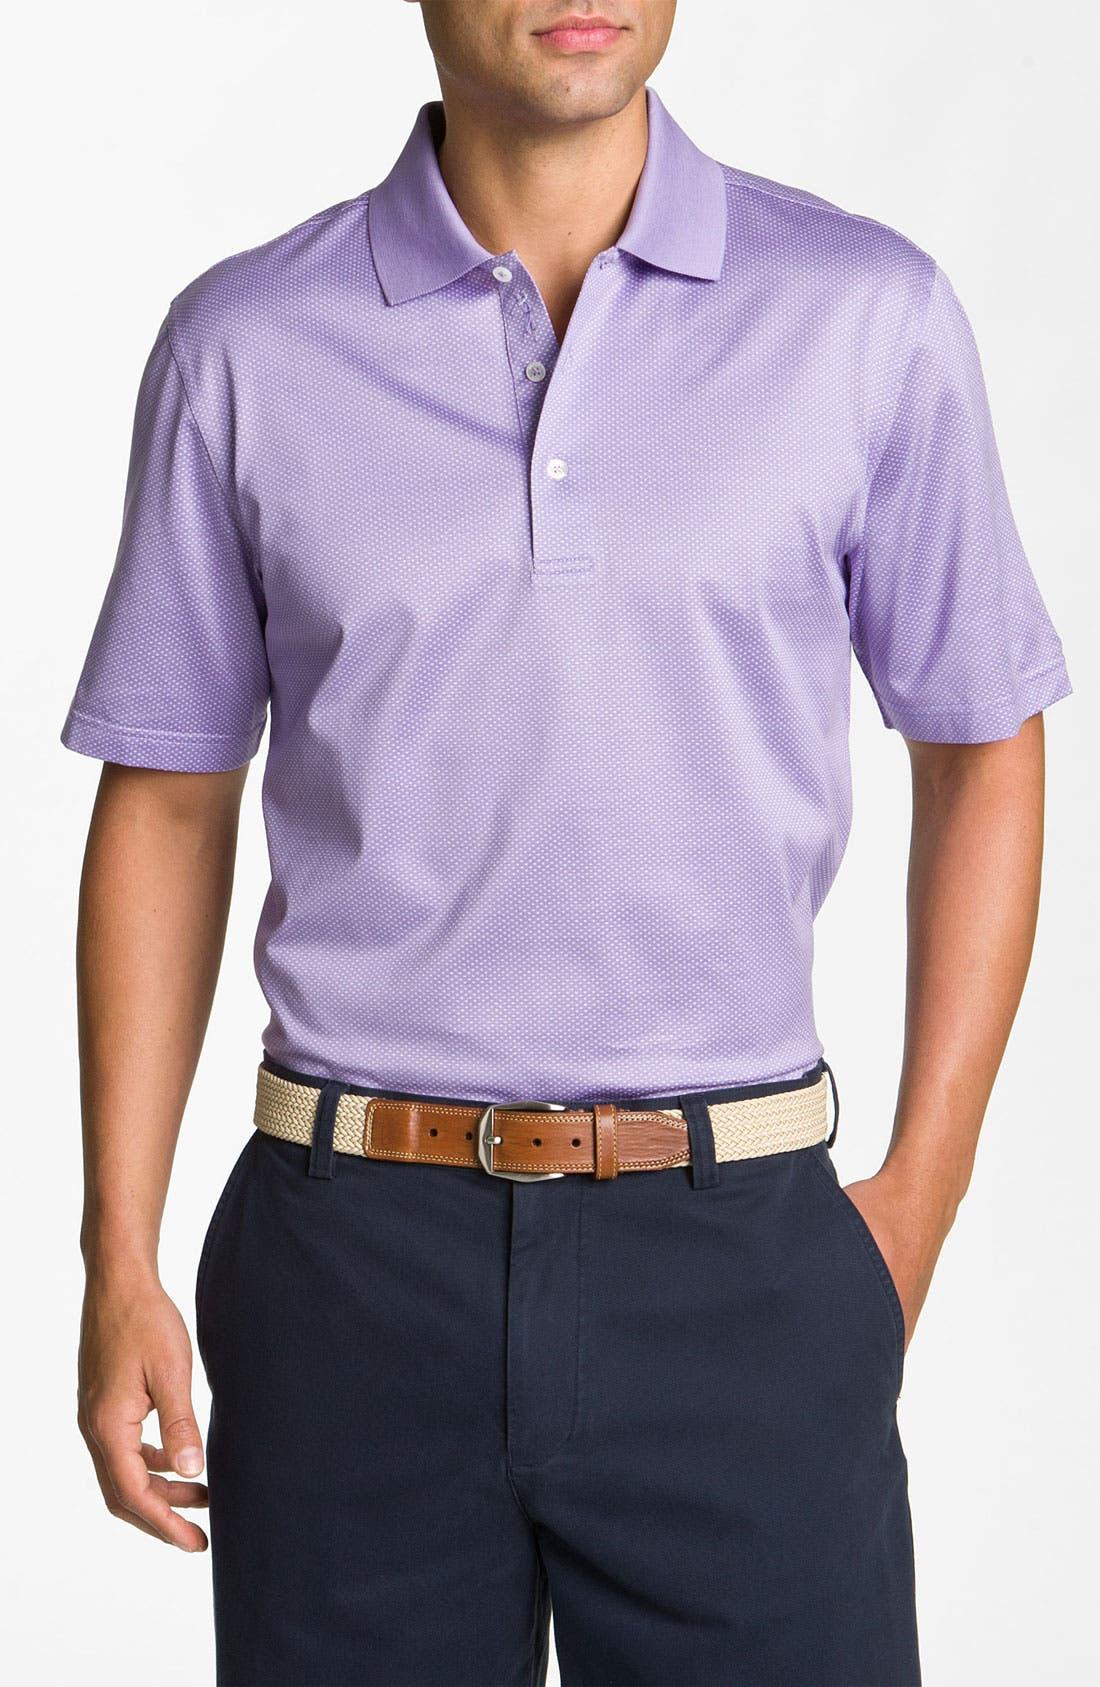 Alternate Image 1 Selected - Bobby Jones 'Dash' Jacquard Golf Polo